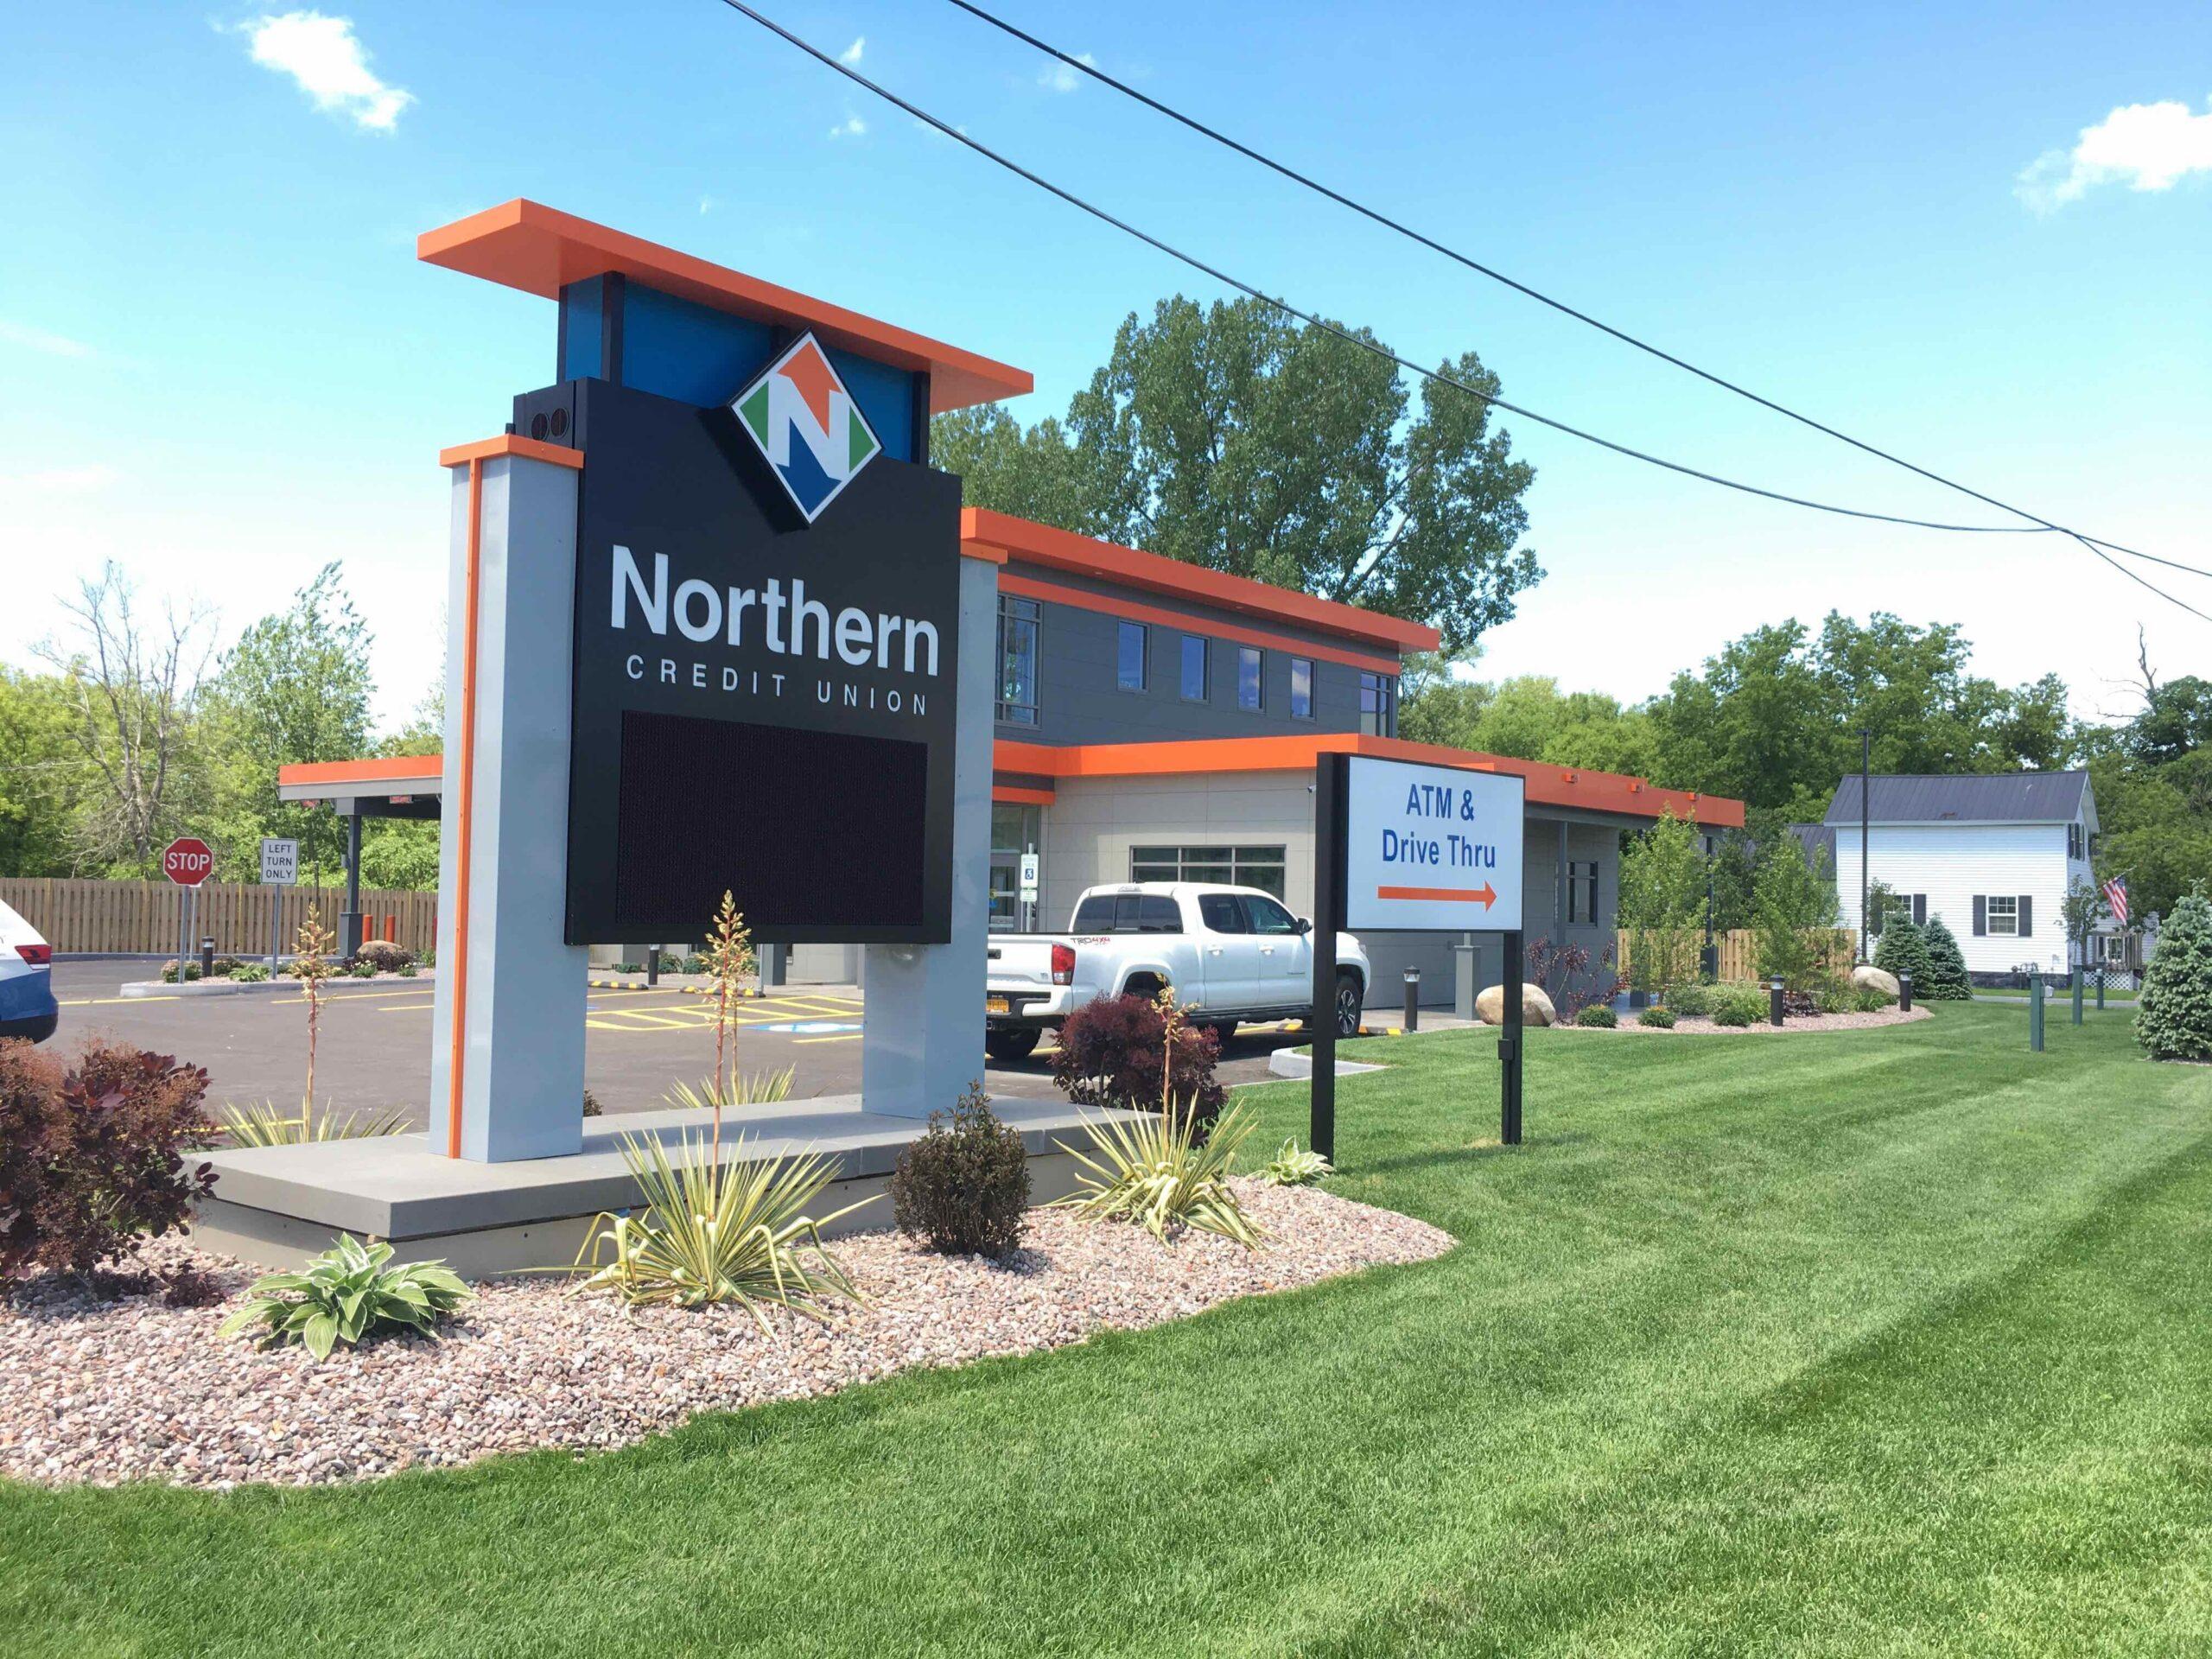 Northern Credit Union Adams